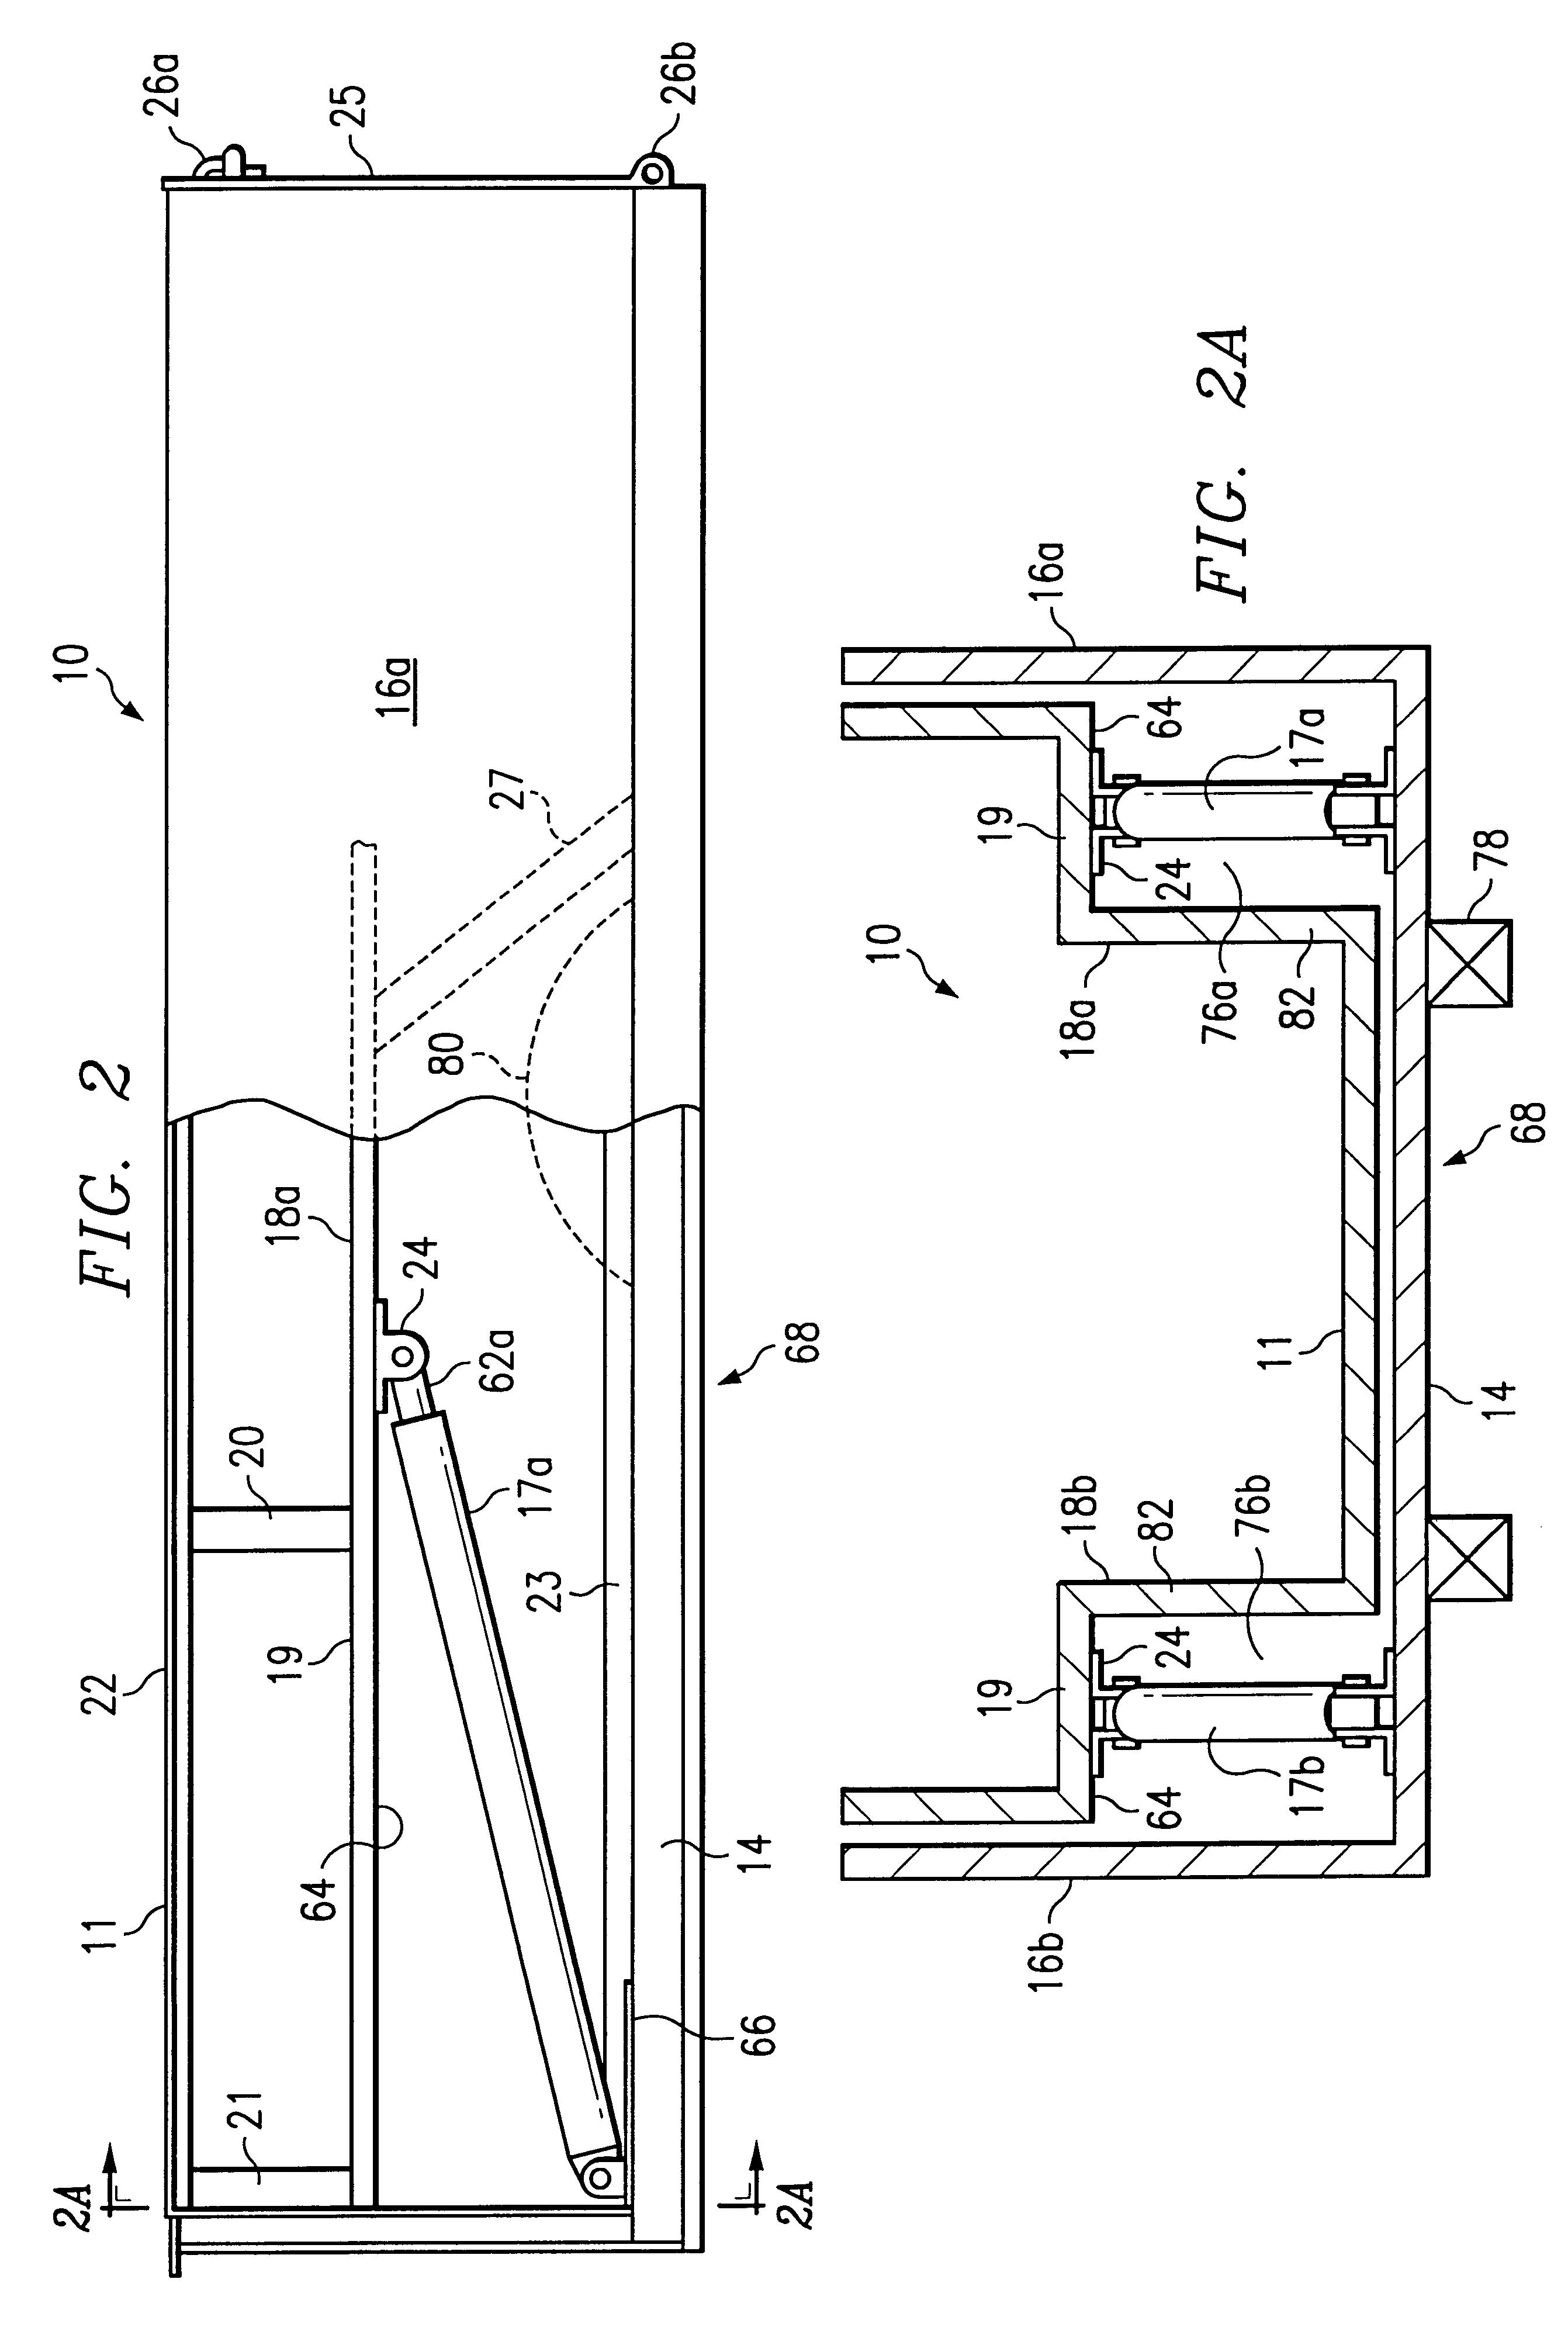 US06196634 20010306 D00002 patent us6196634 dumping bed liner for pickup truck google patents ez dumper wiring diagram at n-0.co